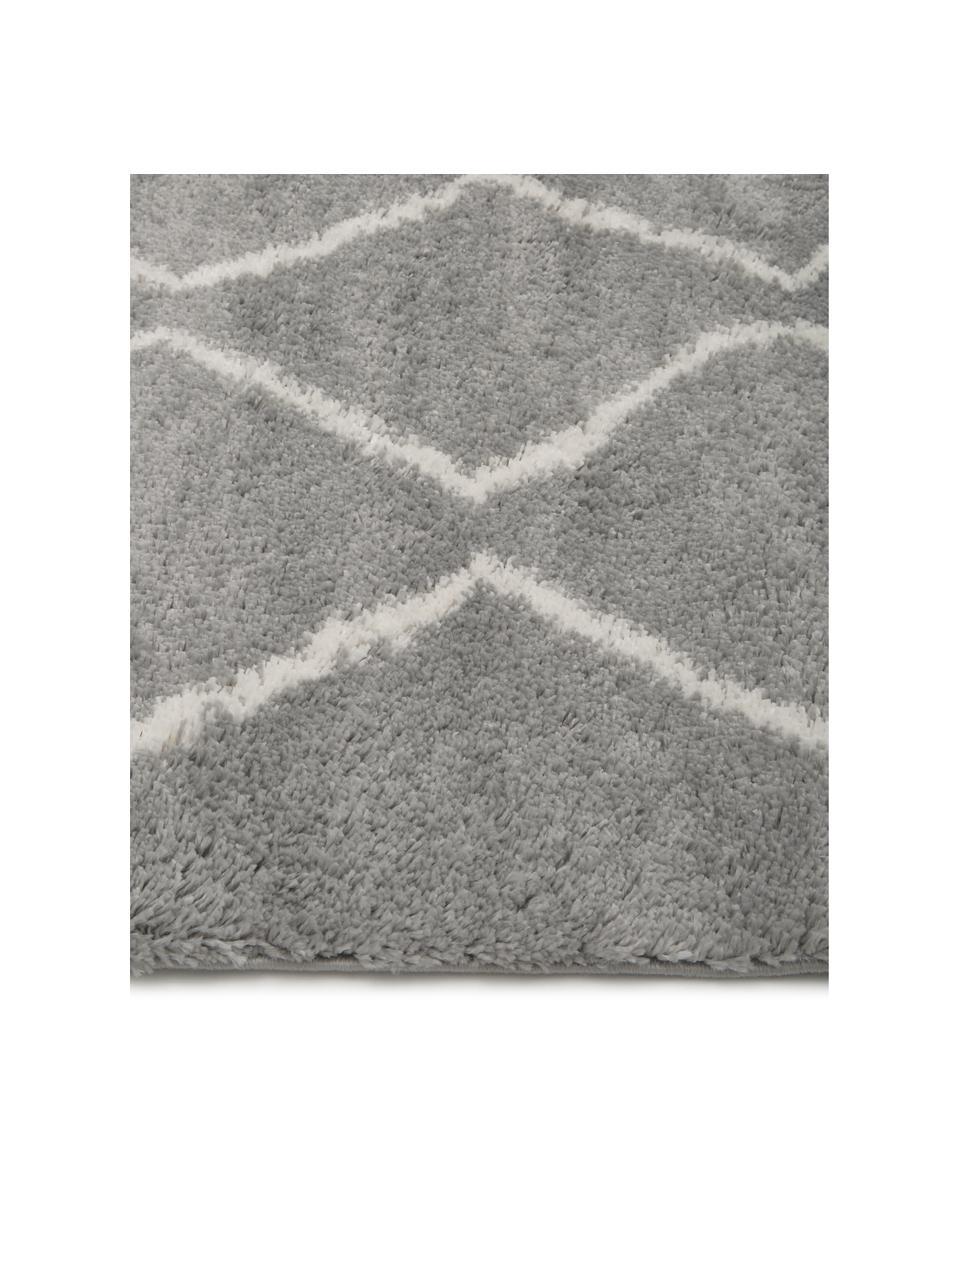 Hochflor-Teppich Velma in Grau/Creme, Flor: 100% Polypropylen, Grau, Cremeweiß, B 300 x L 400 cm (Größe XL)